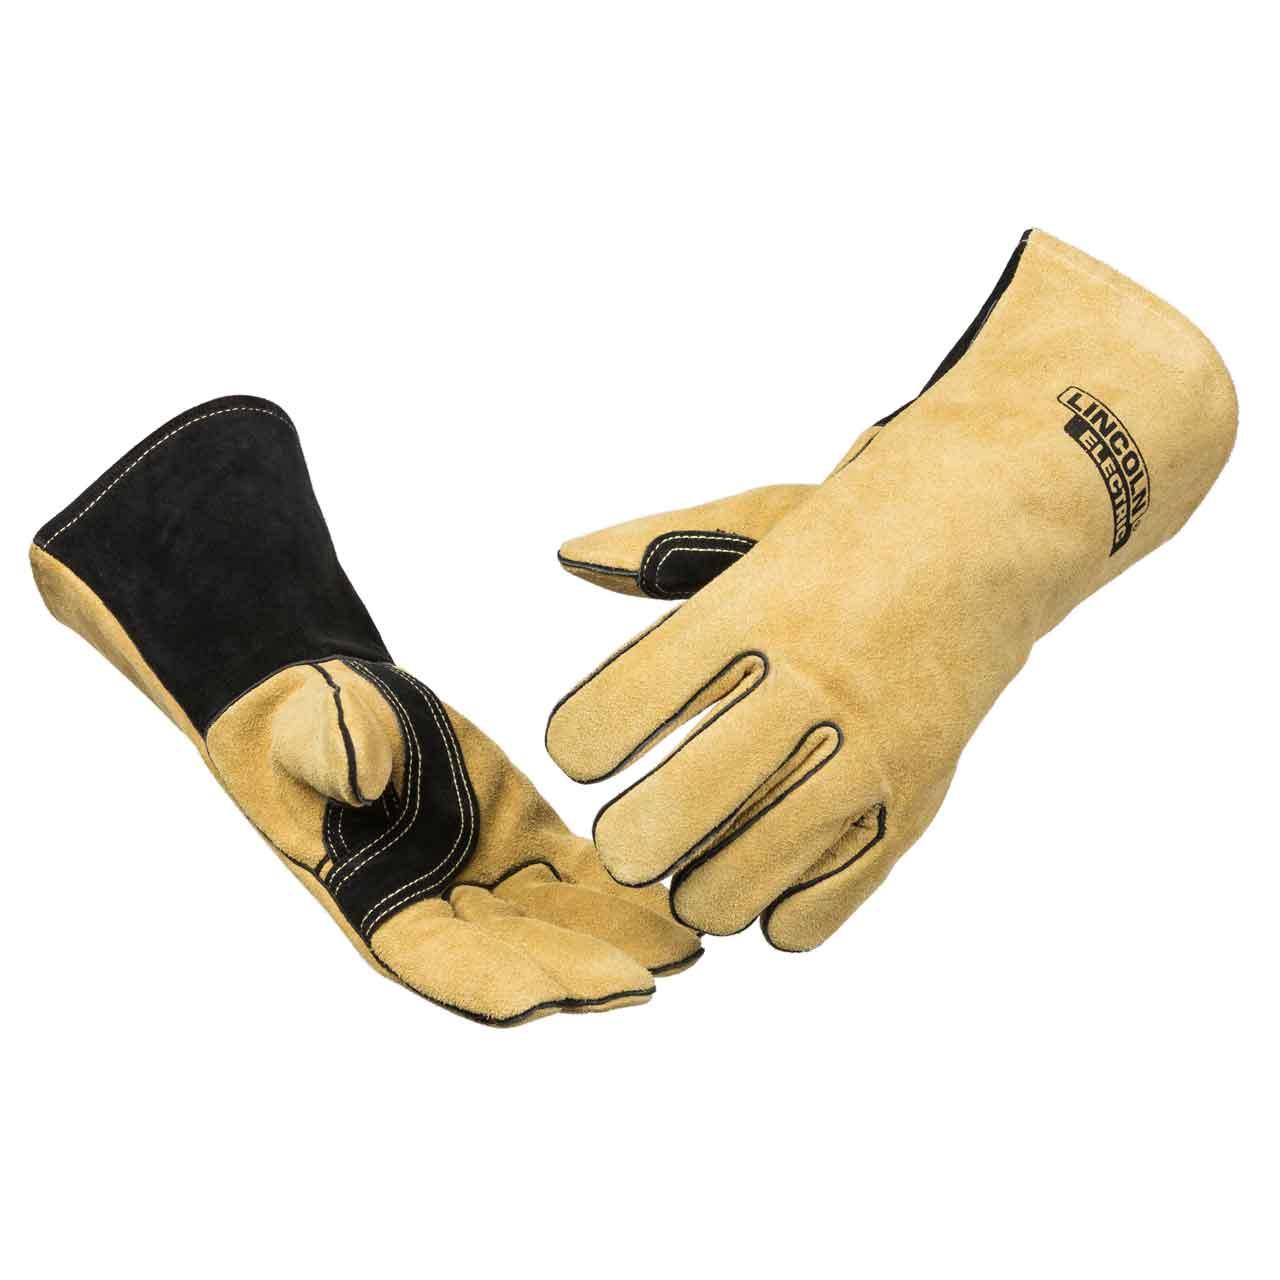 Lincoln K4082 MIG/Stick Welding Gloves